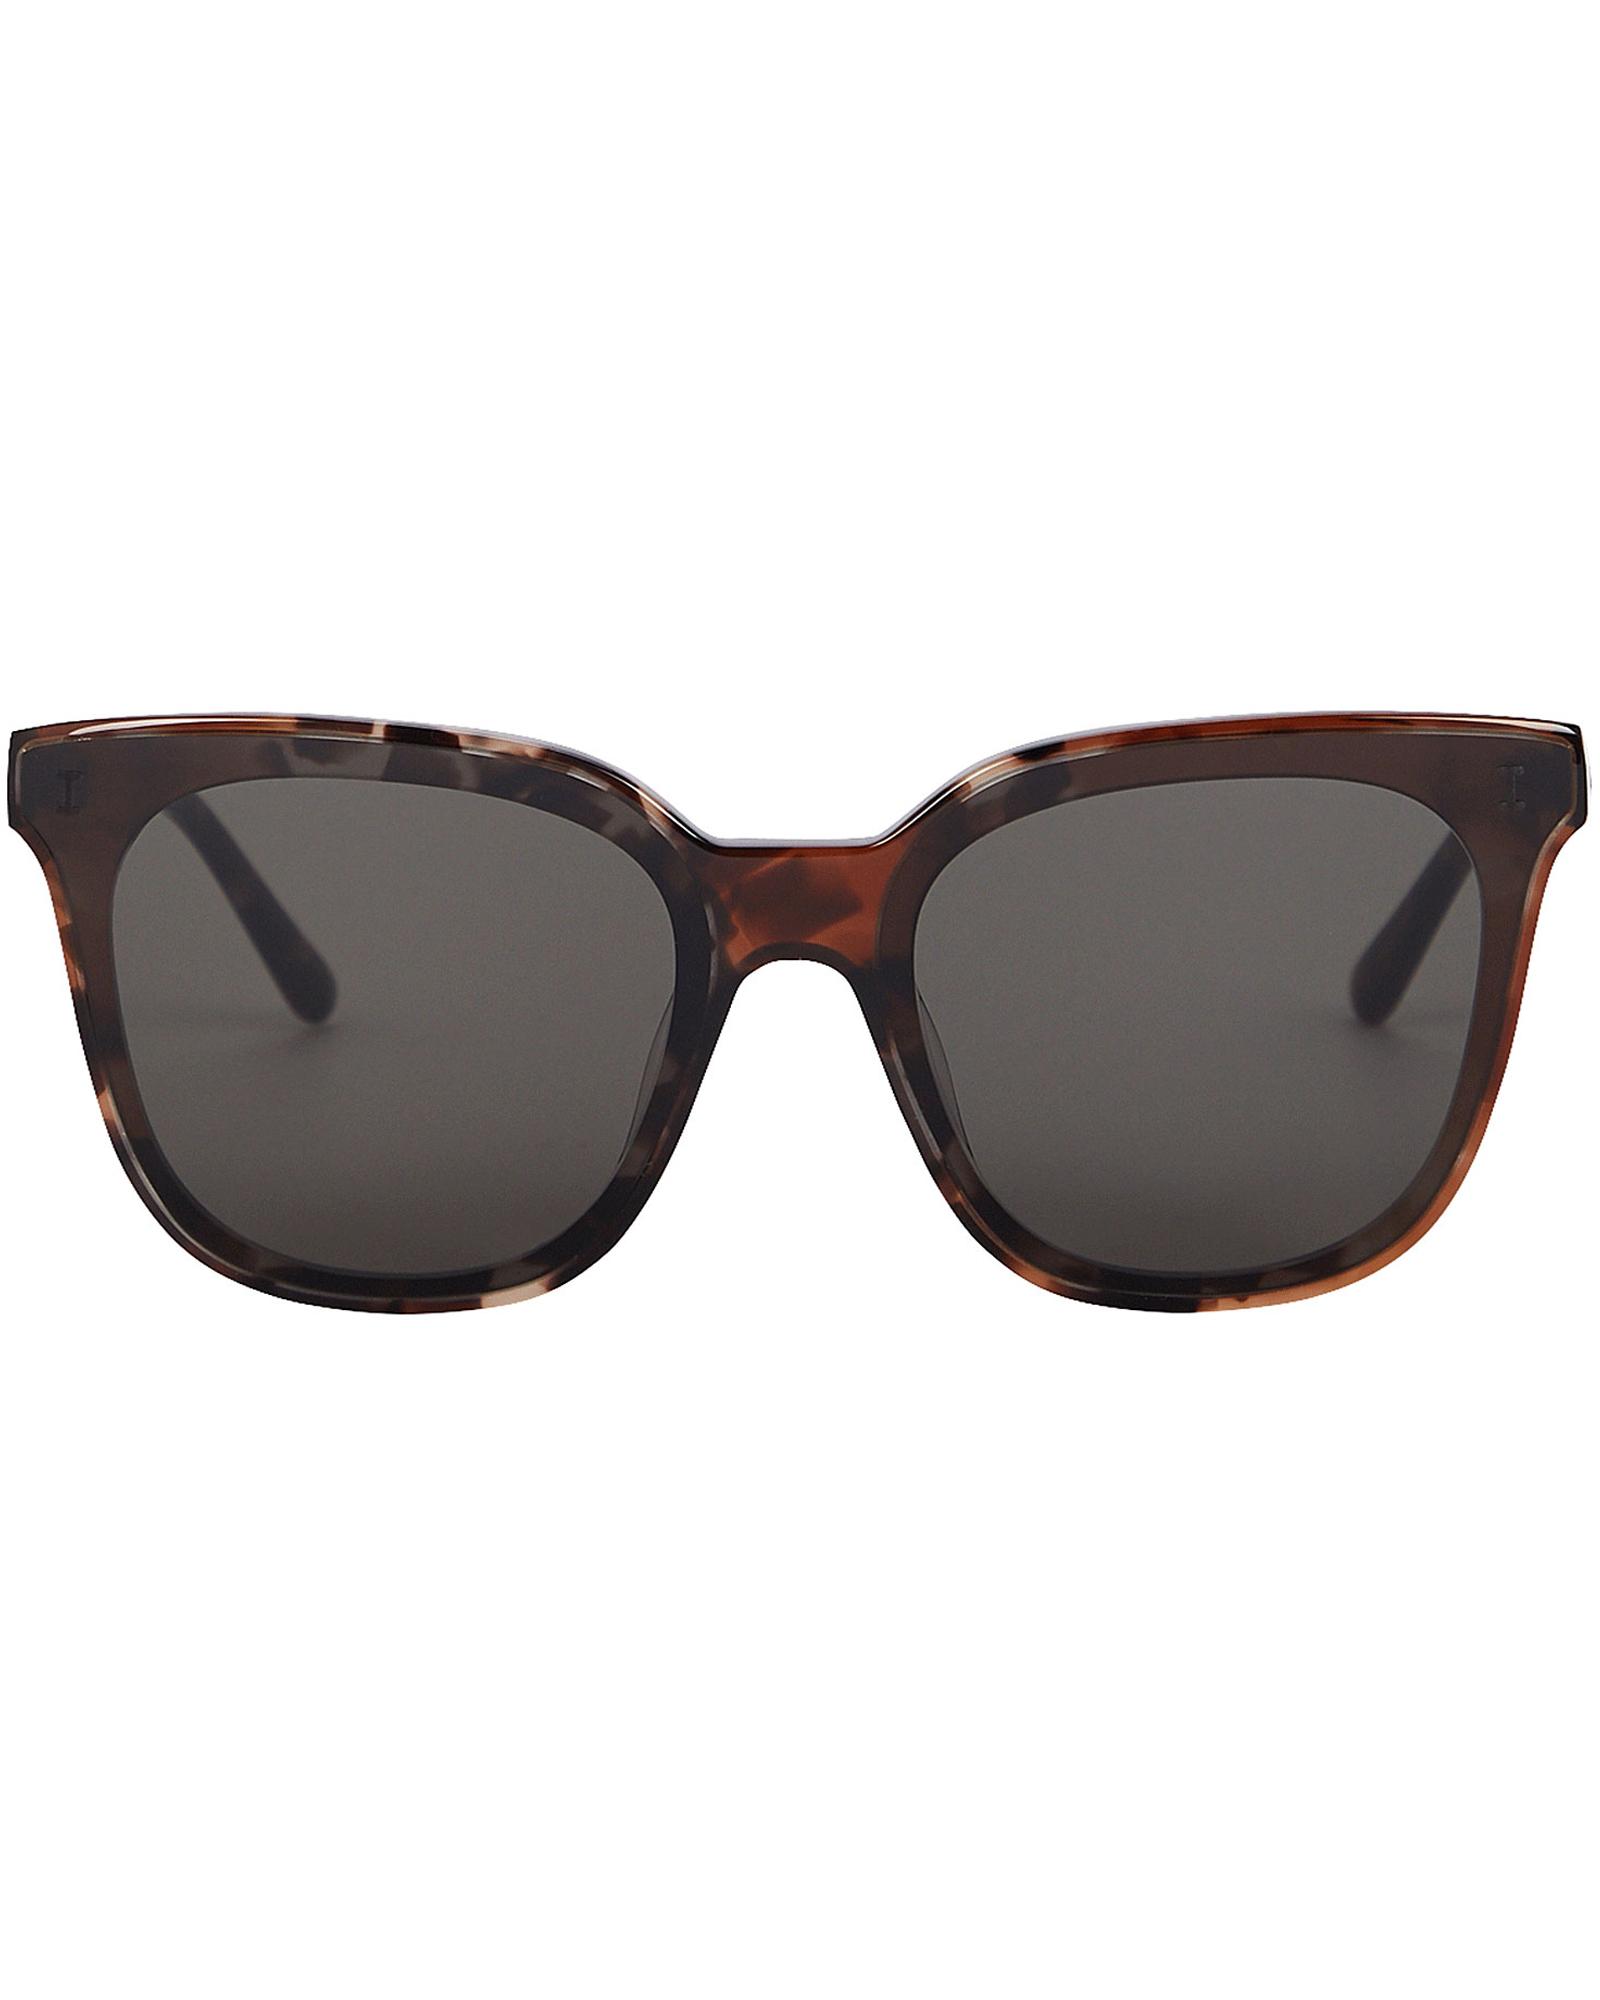 Illesteva Sunglasses Camille Oversized Wayfarer Sunglasses